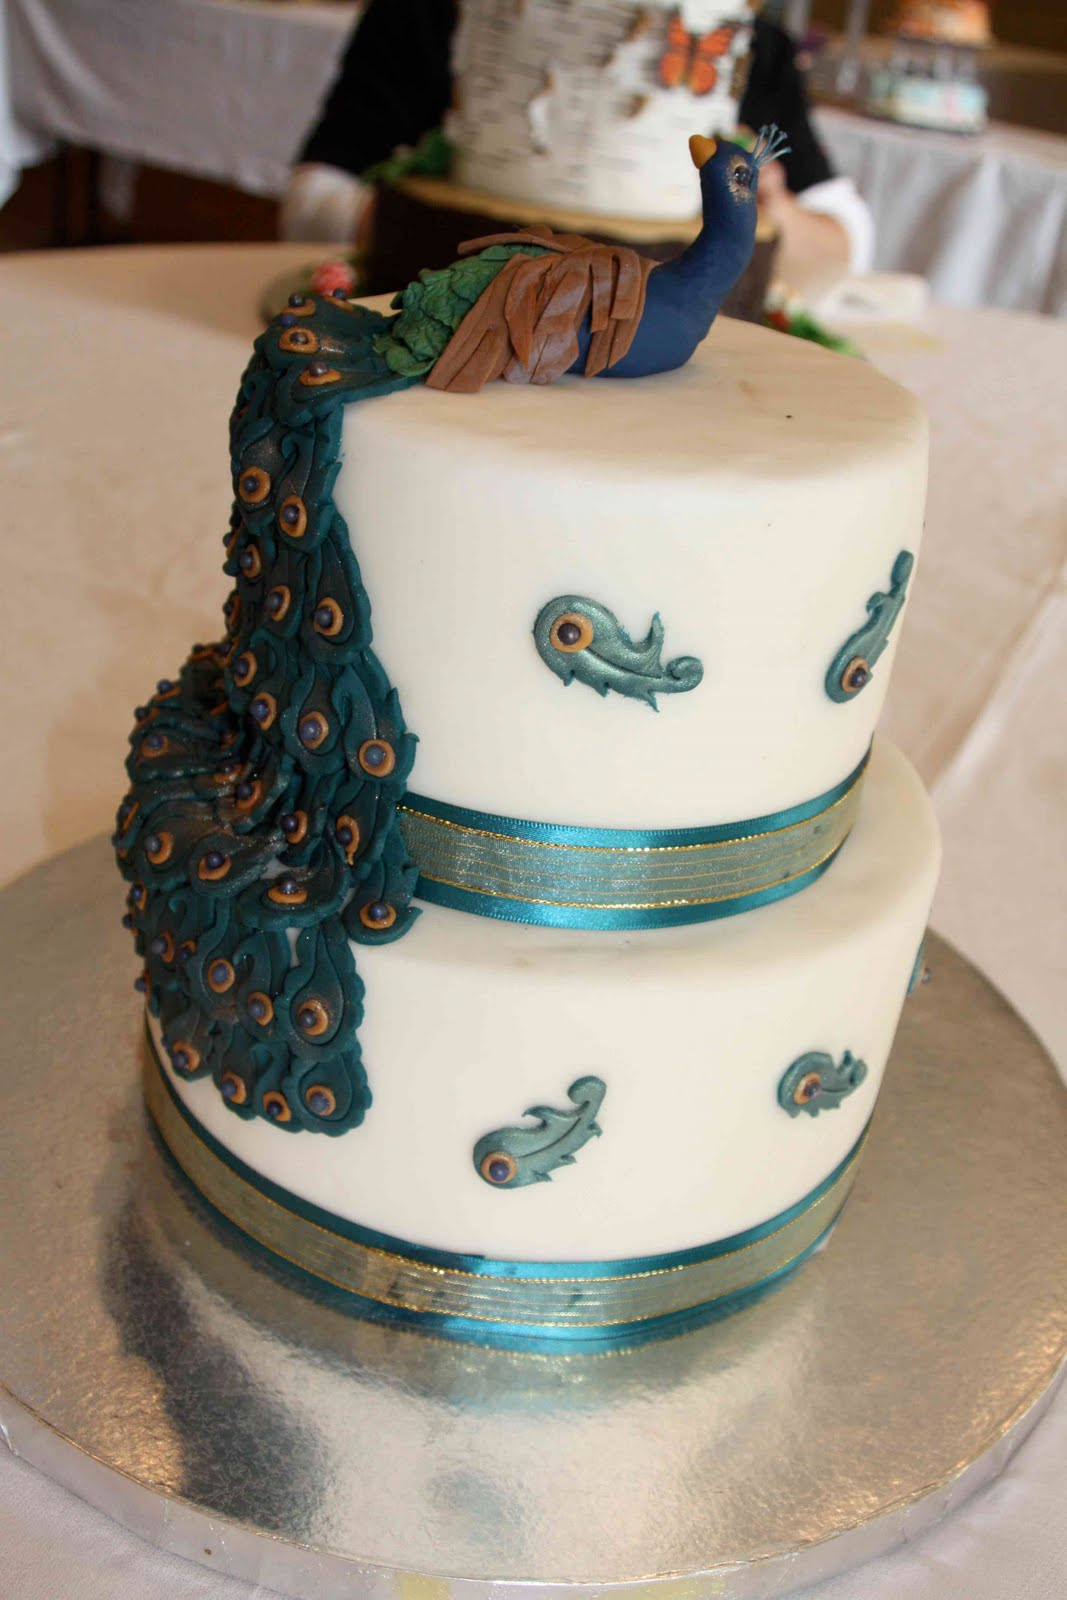 Stupendous Peacock Cakes Decoration Ideas Little Birthday Cakes Personalised Birthday Cards Veneteletsinfo